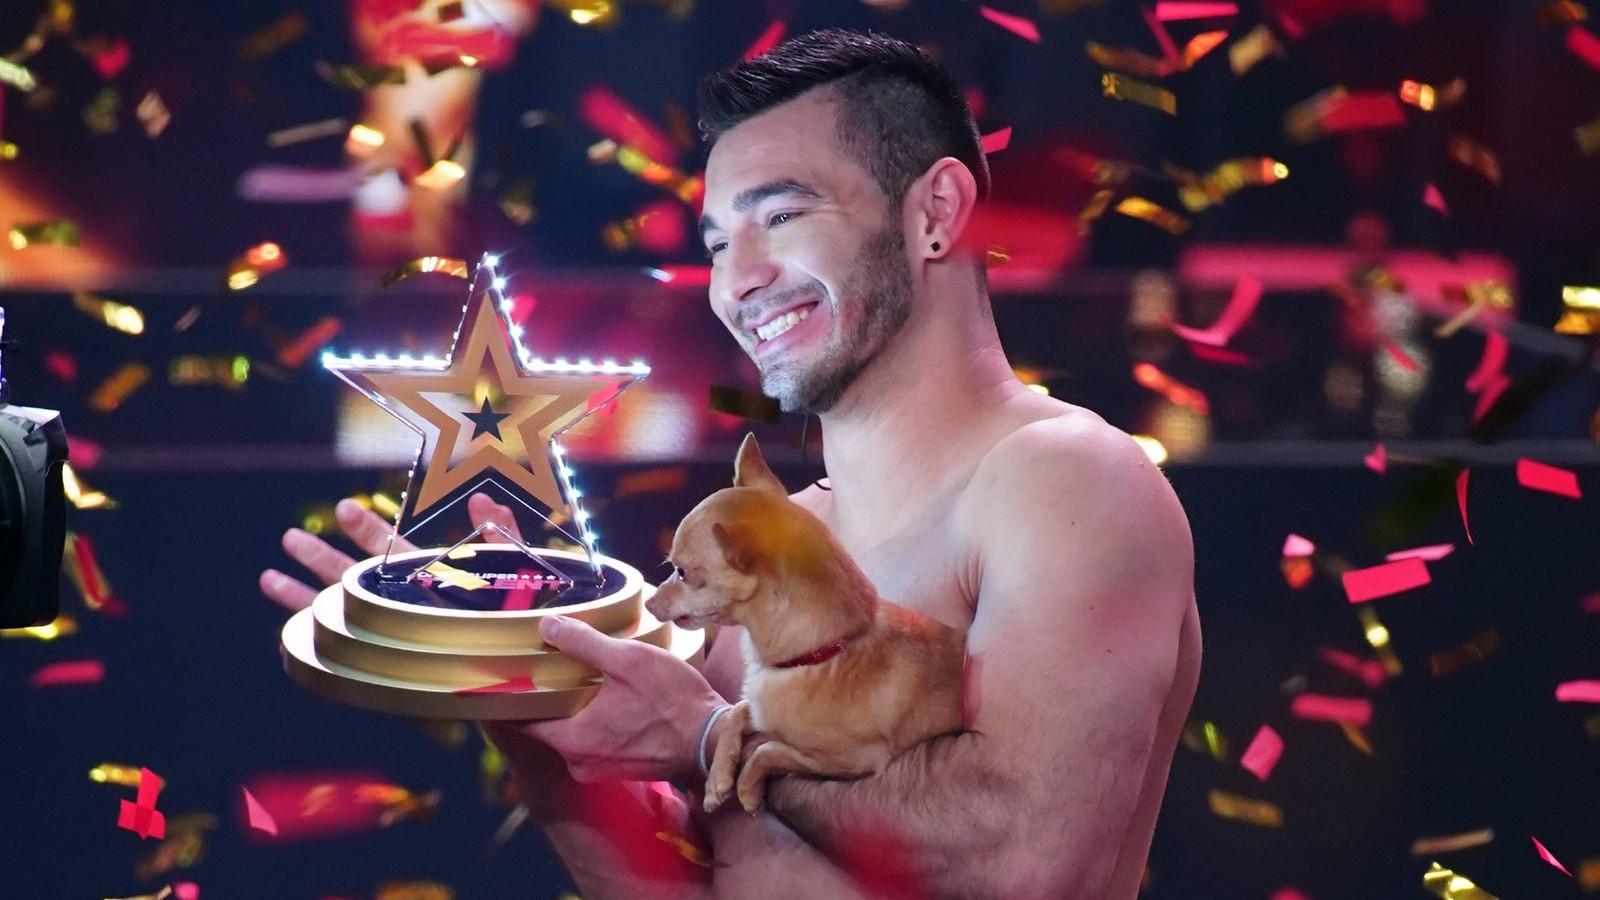 Christian und Hund Percy